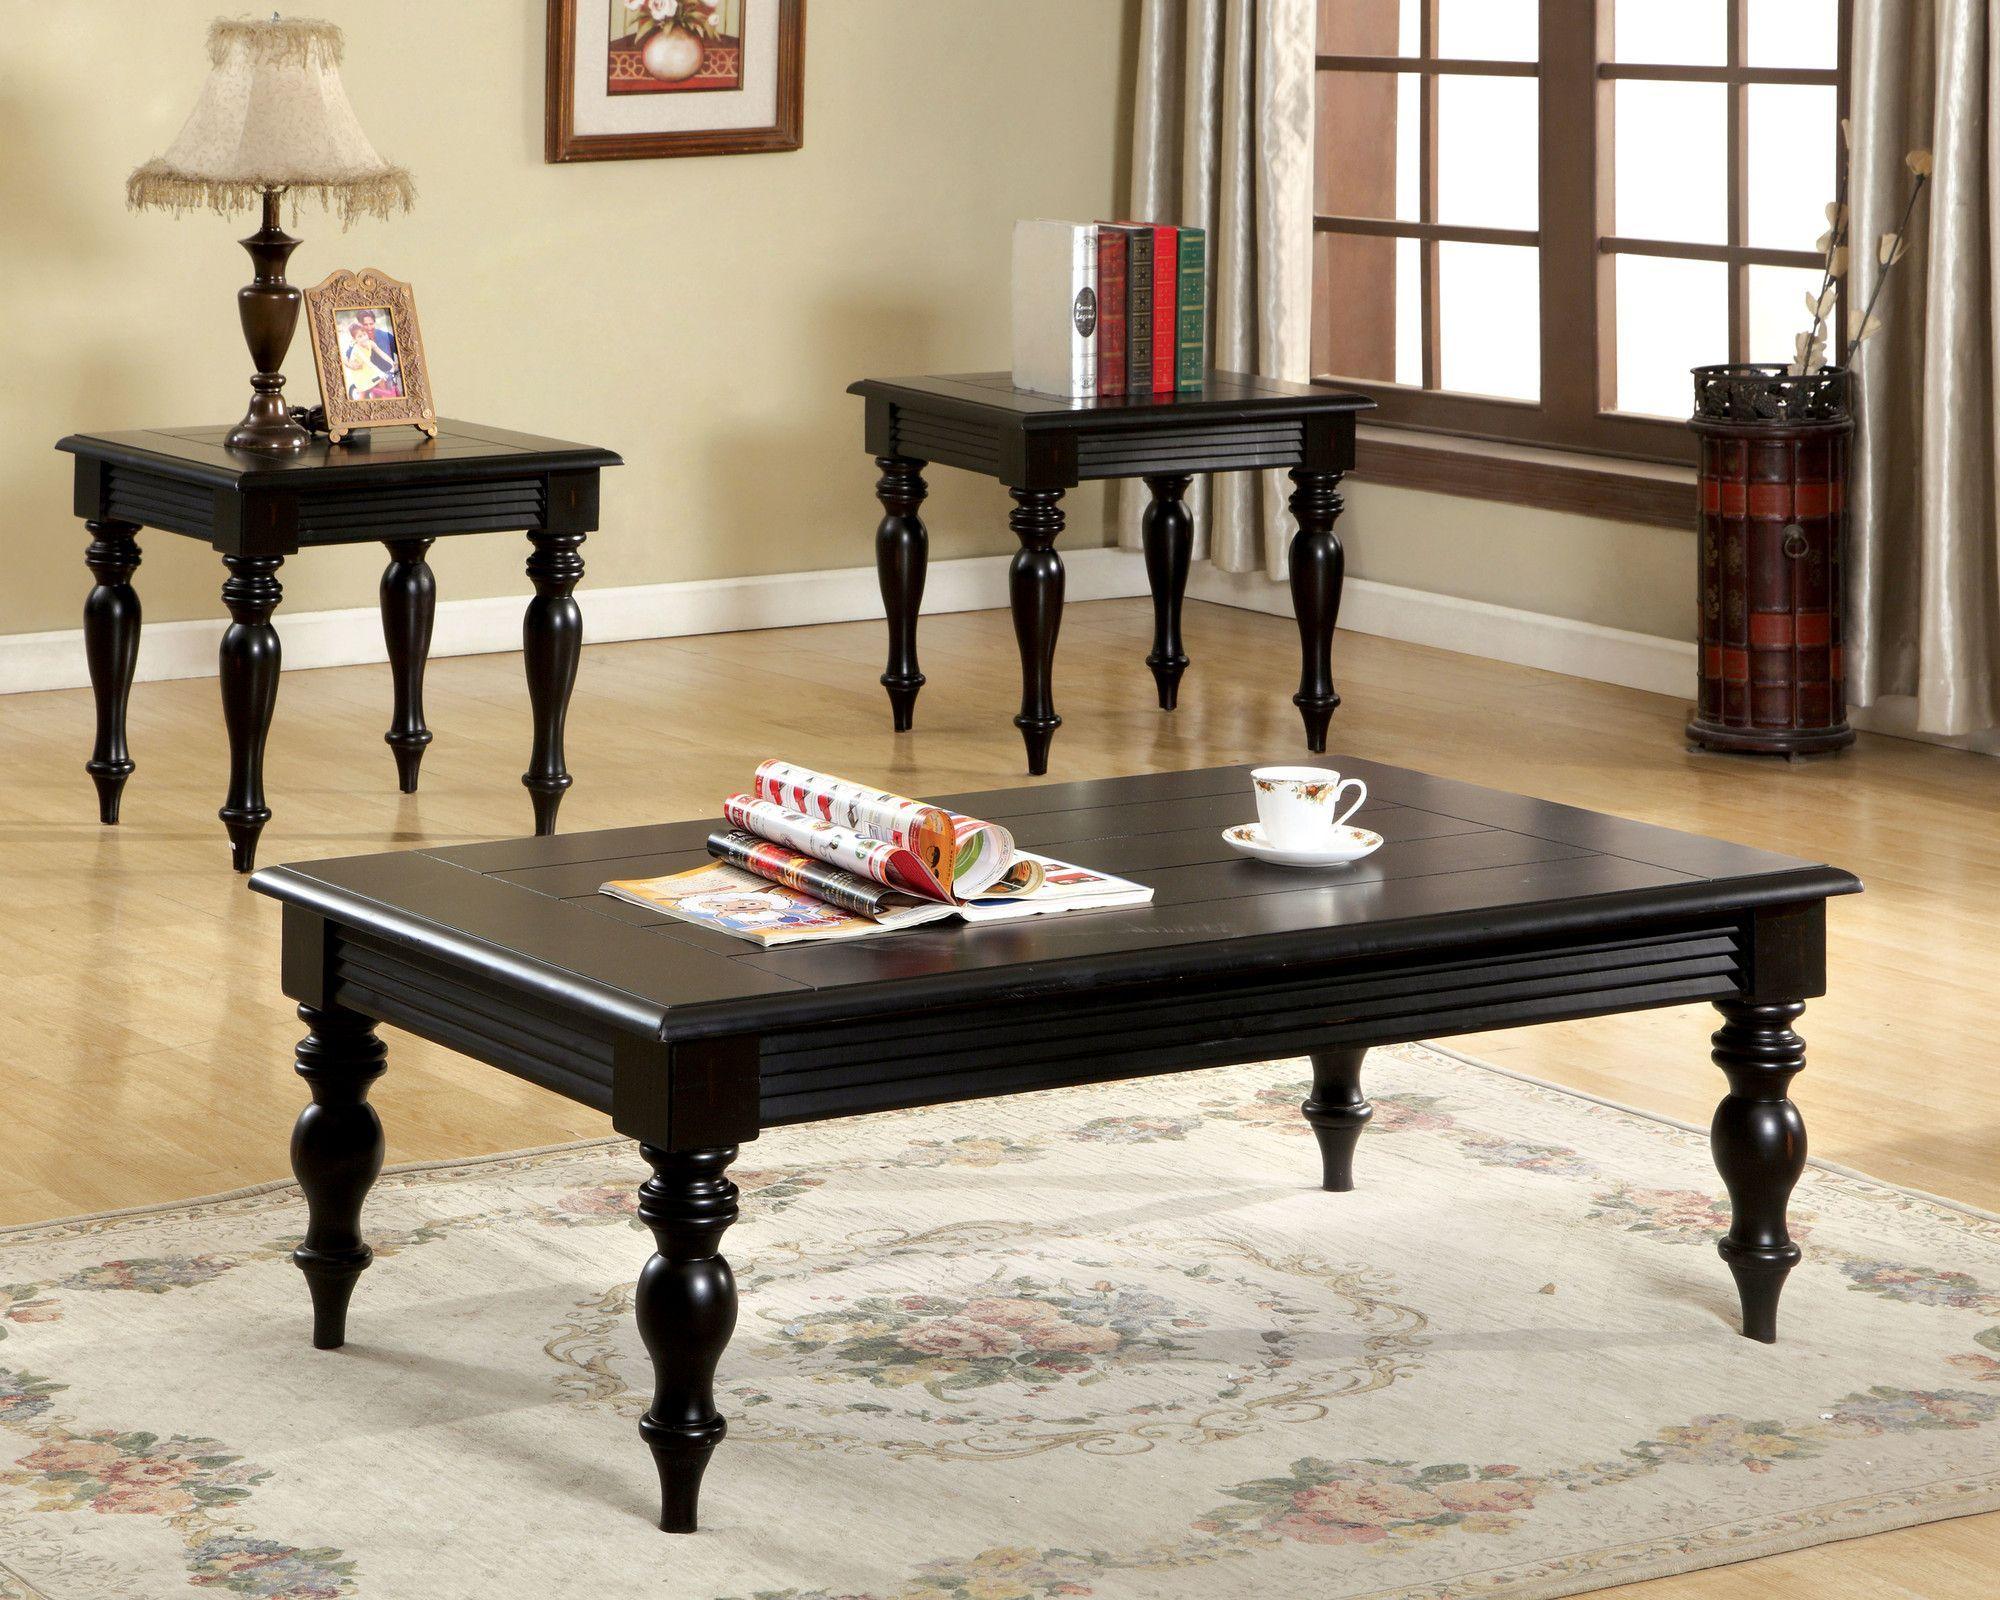 Hokku Designs Degrei 3 Piece Coffee Table Set Coffee Table 3 Piece Coffee Table Set Coffee Table And Side Table Set [ 1600 x 2000 Pixel ]